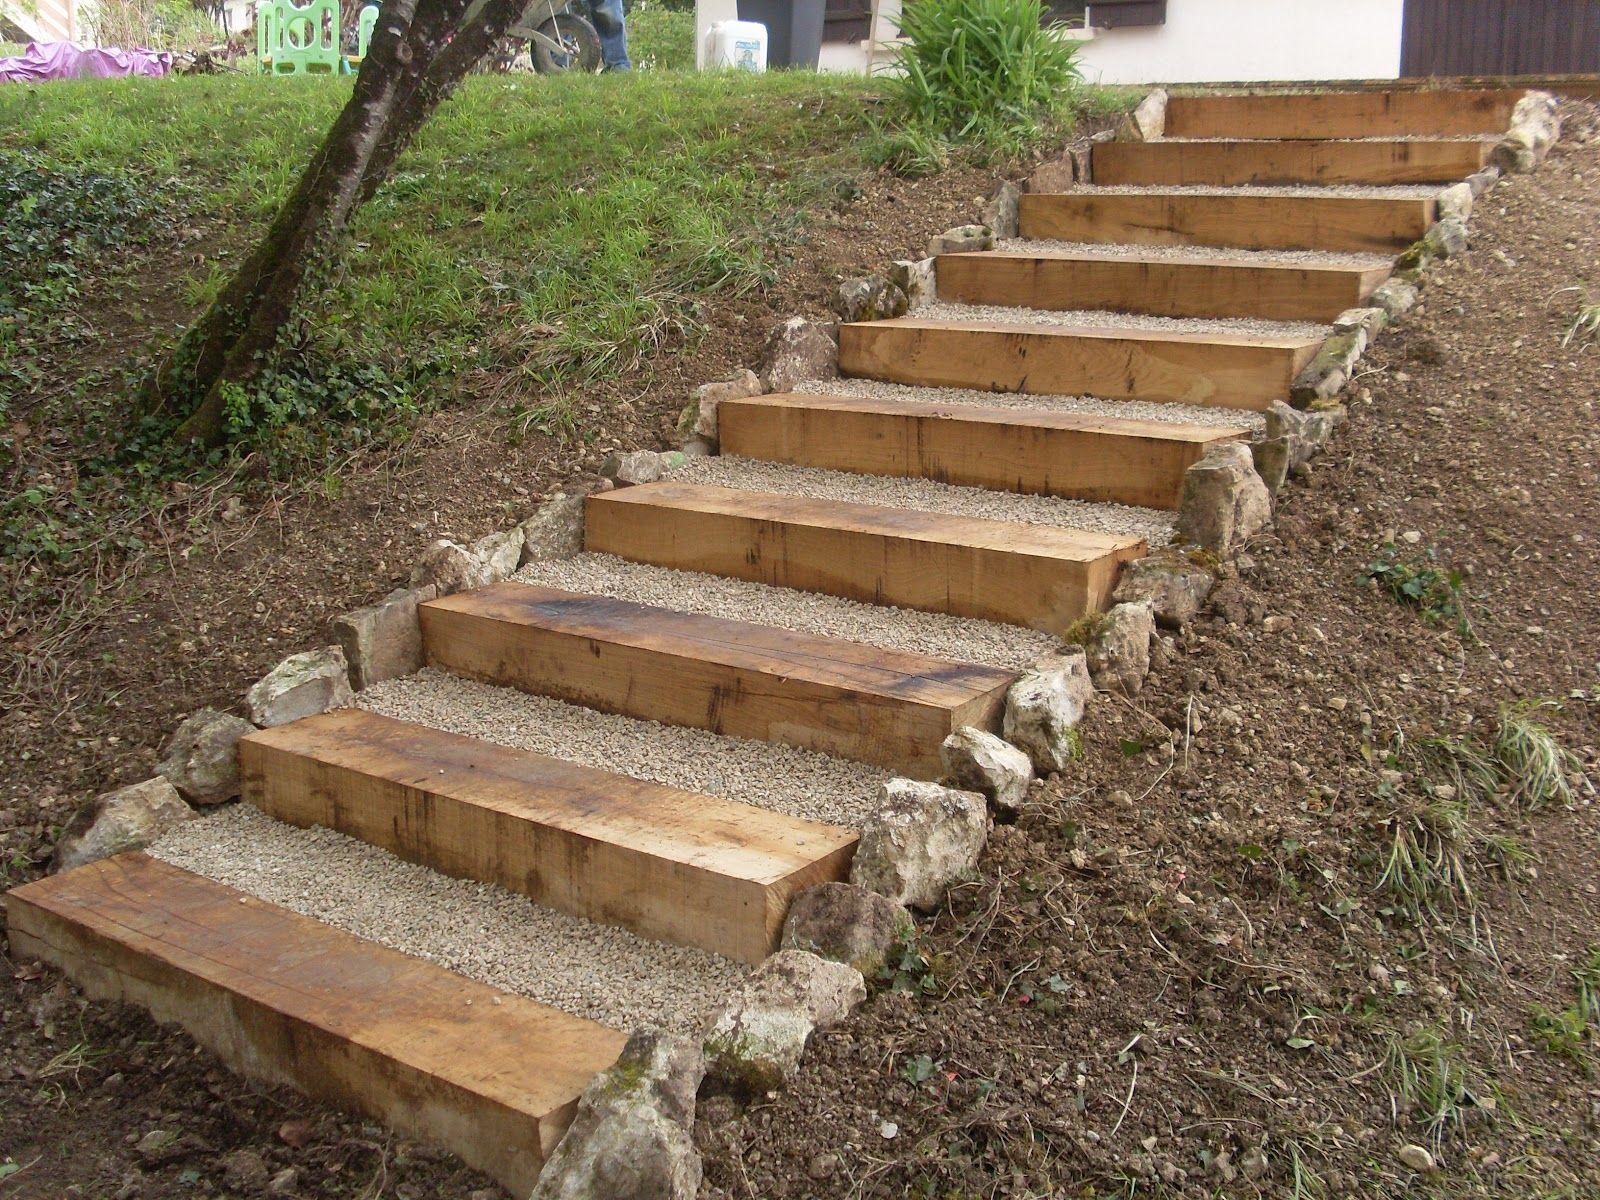 Terrasse en bois et escalier en traverse bois all es for Escalier bois jardin